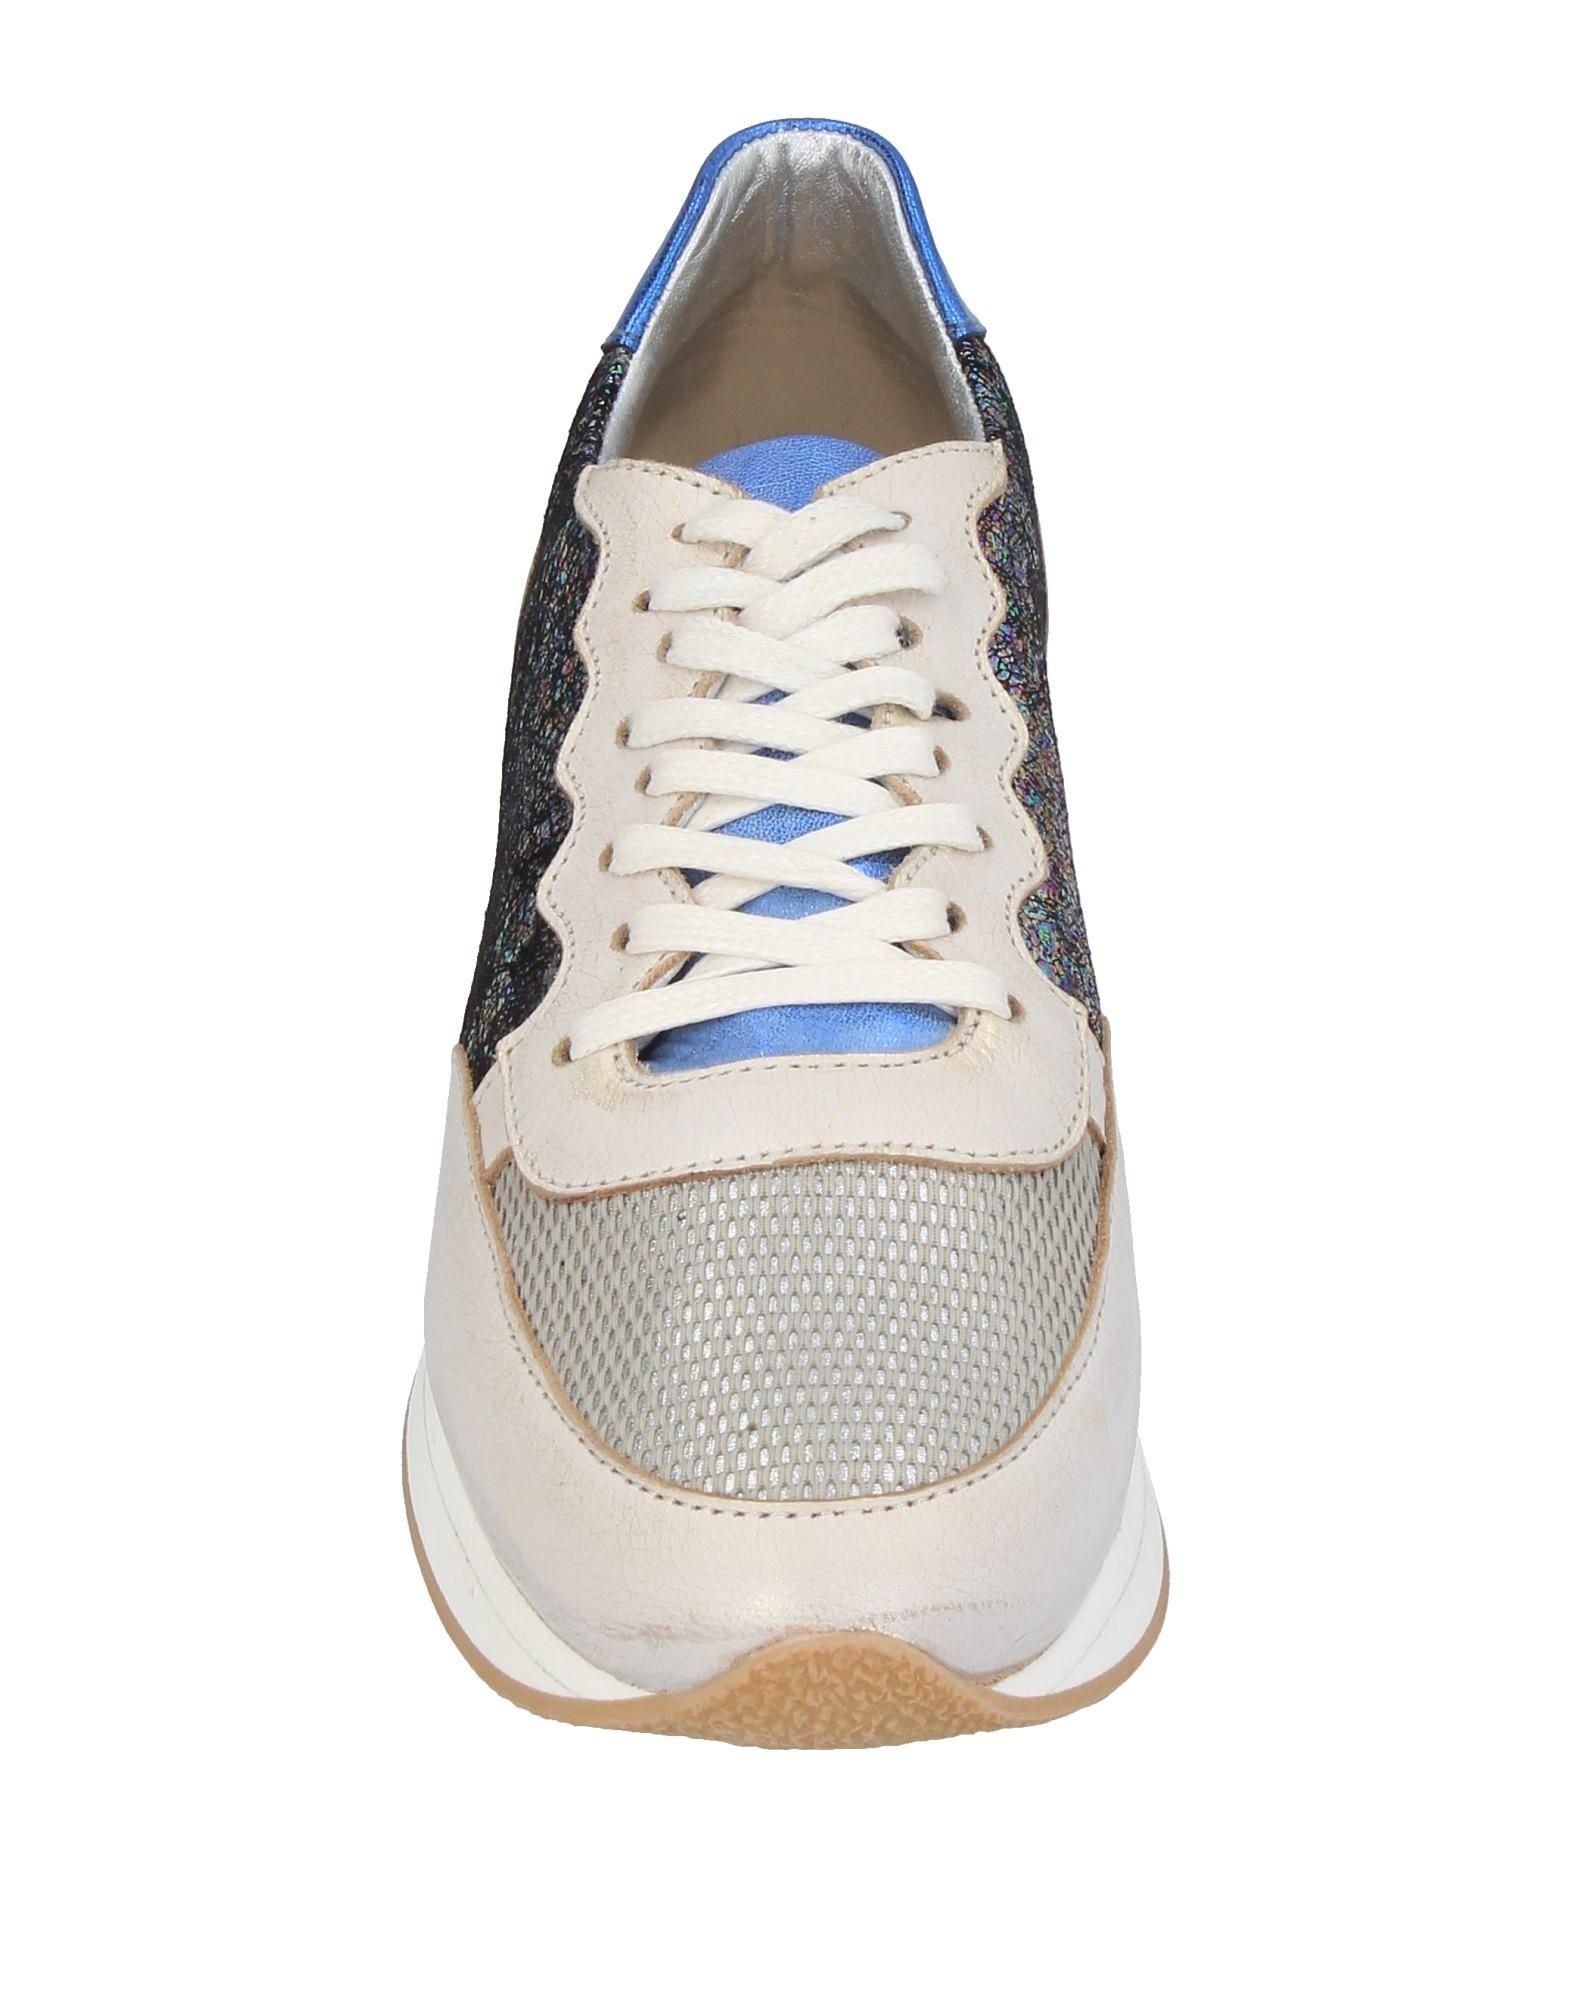 Sneakers Rose Rankin Femme - Sneakers Rose Rankin sur